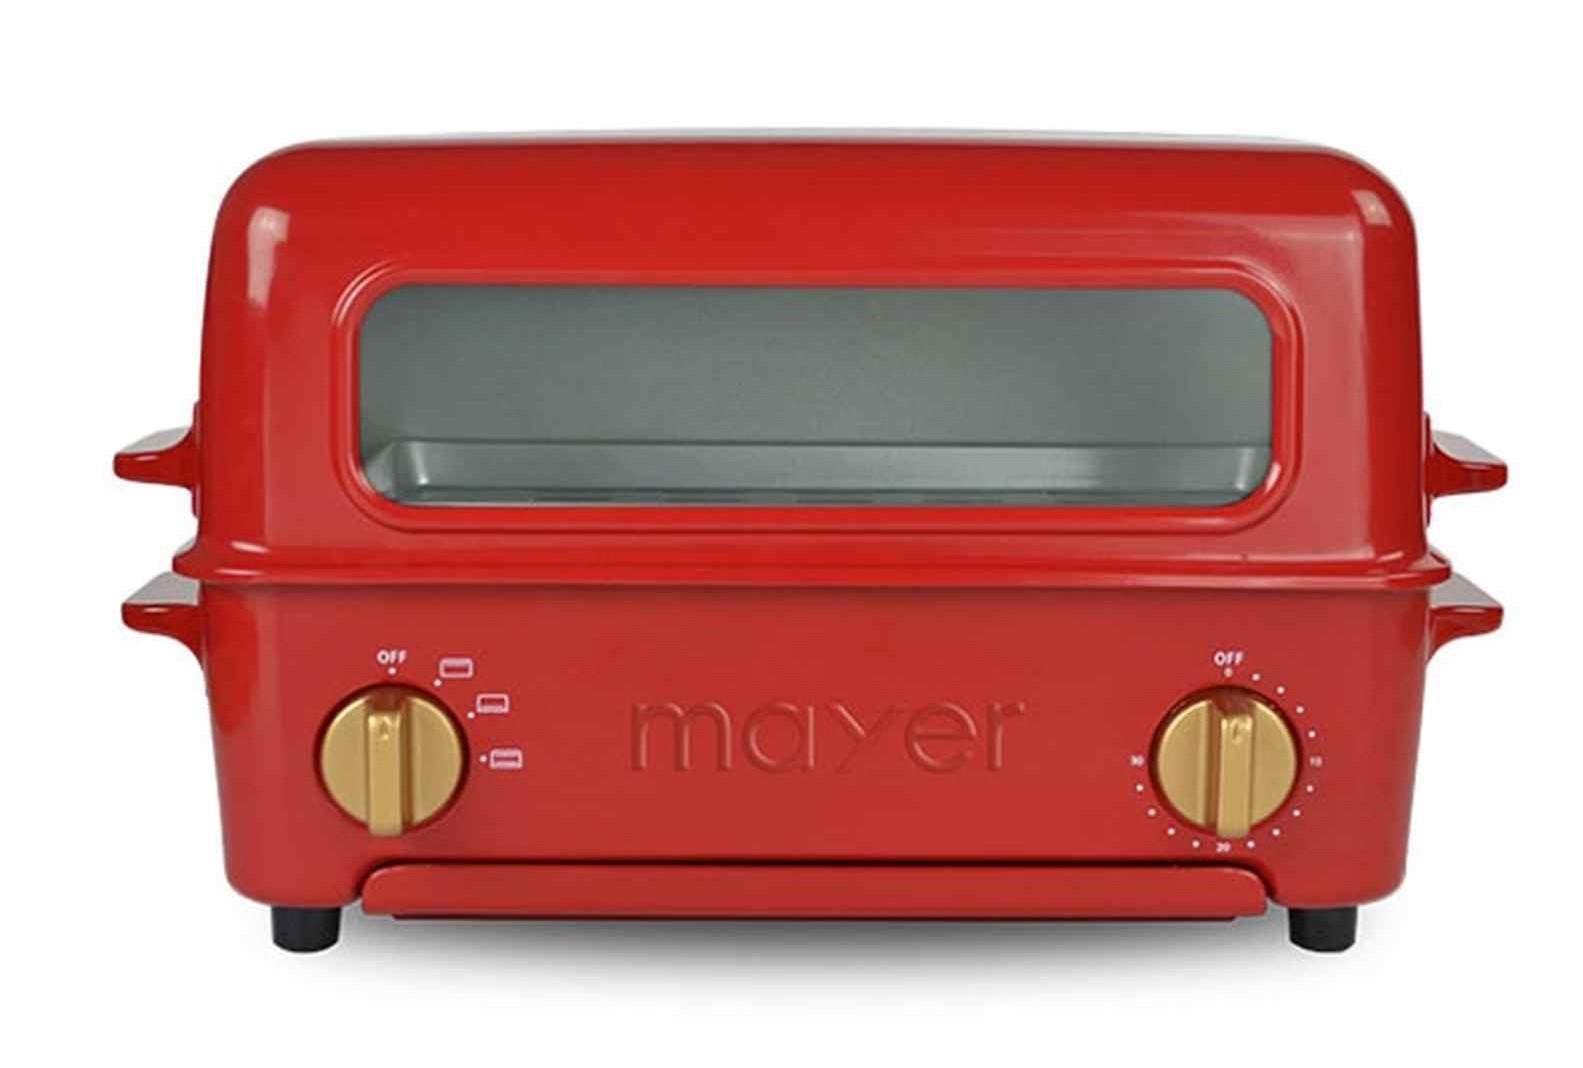 Best Toaster Ovens